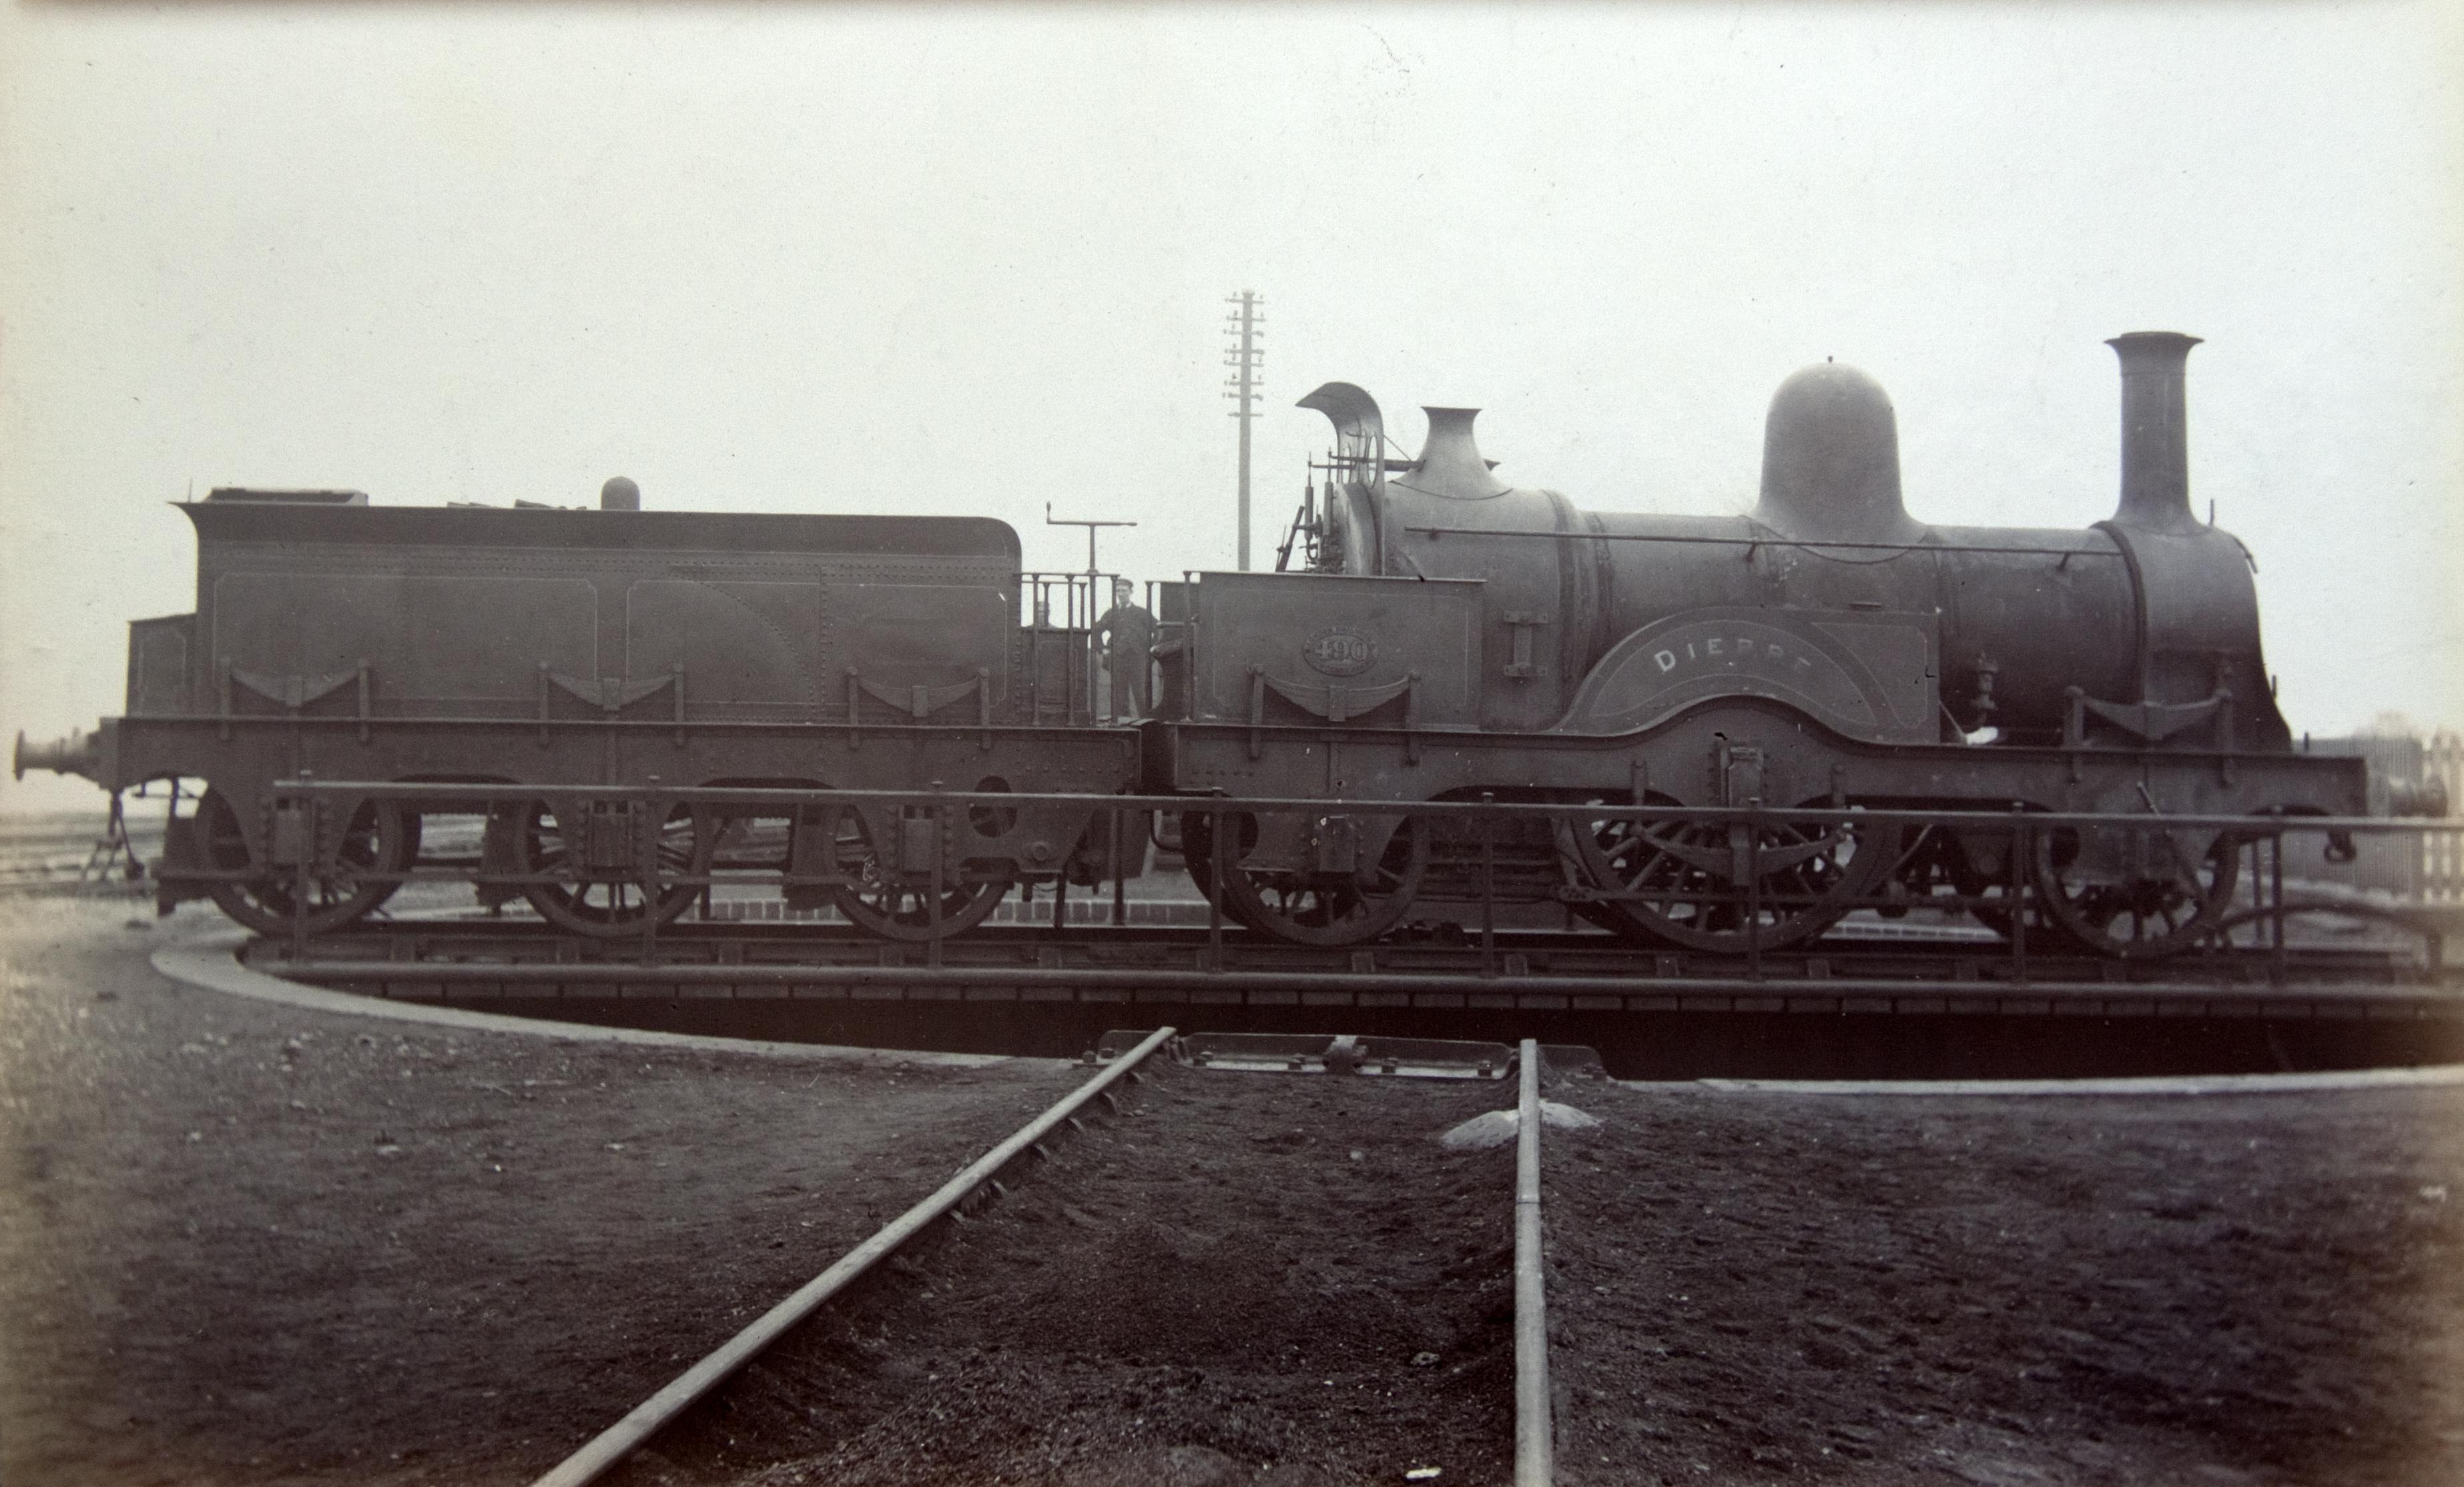 Brighton and South Coast Railway